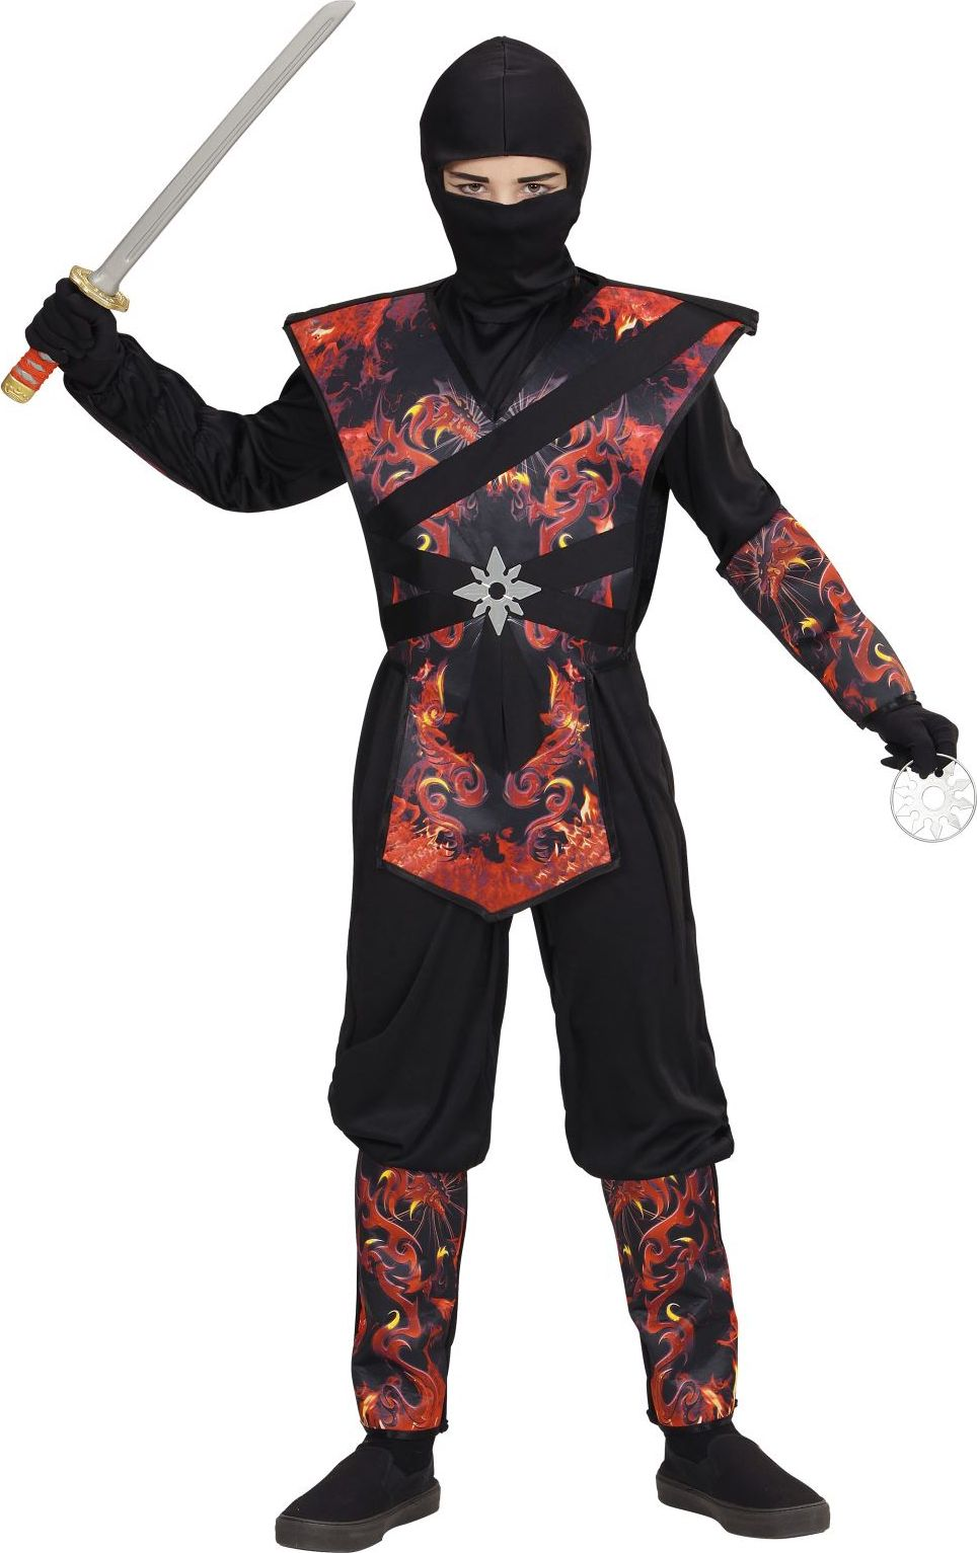 Ninja outfit kind